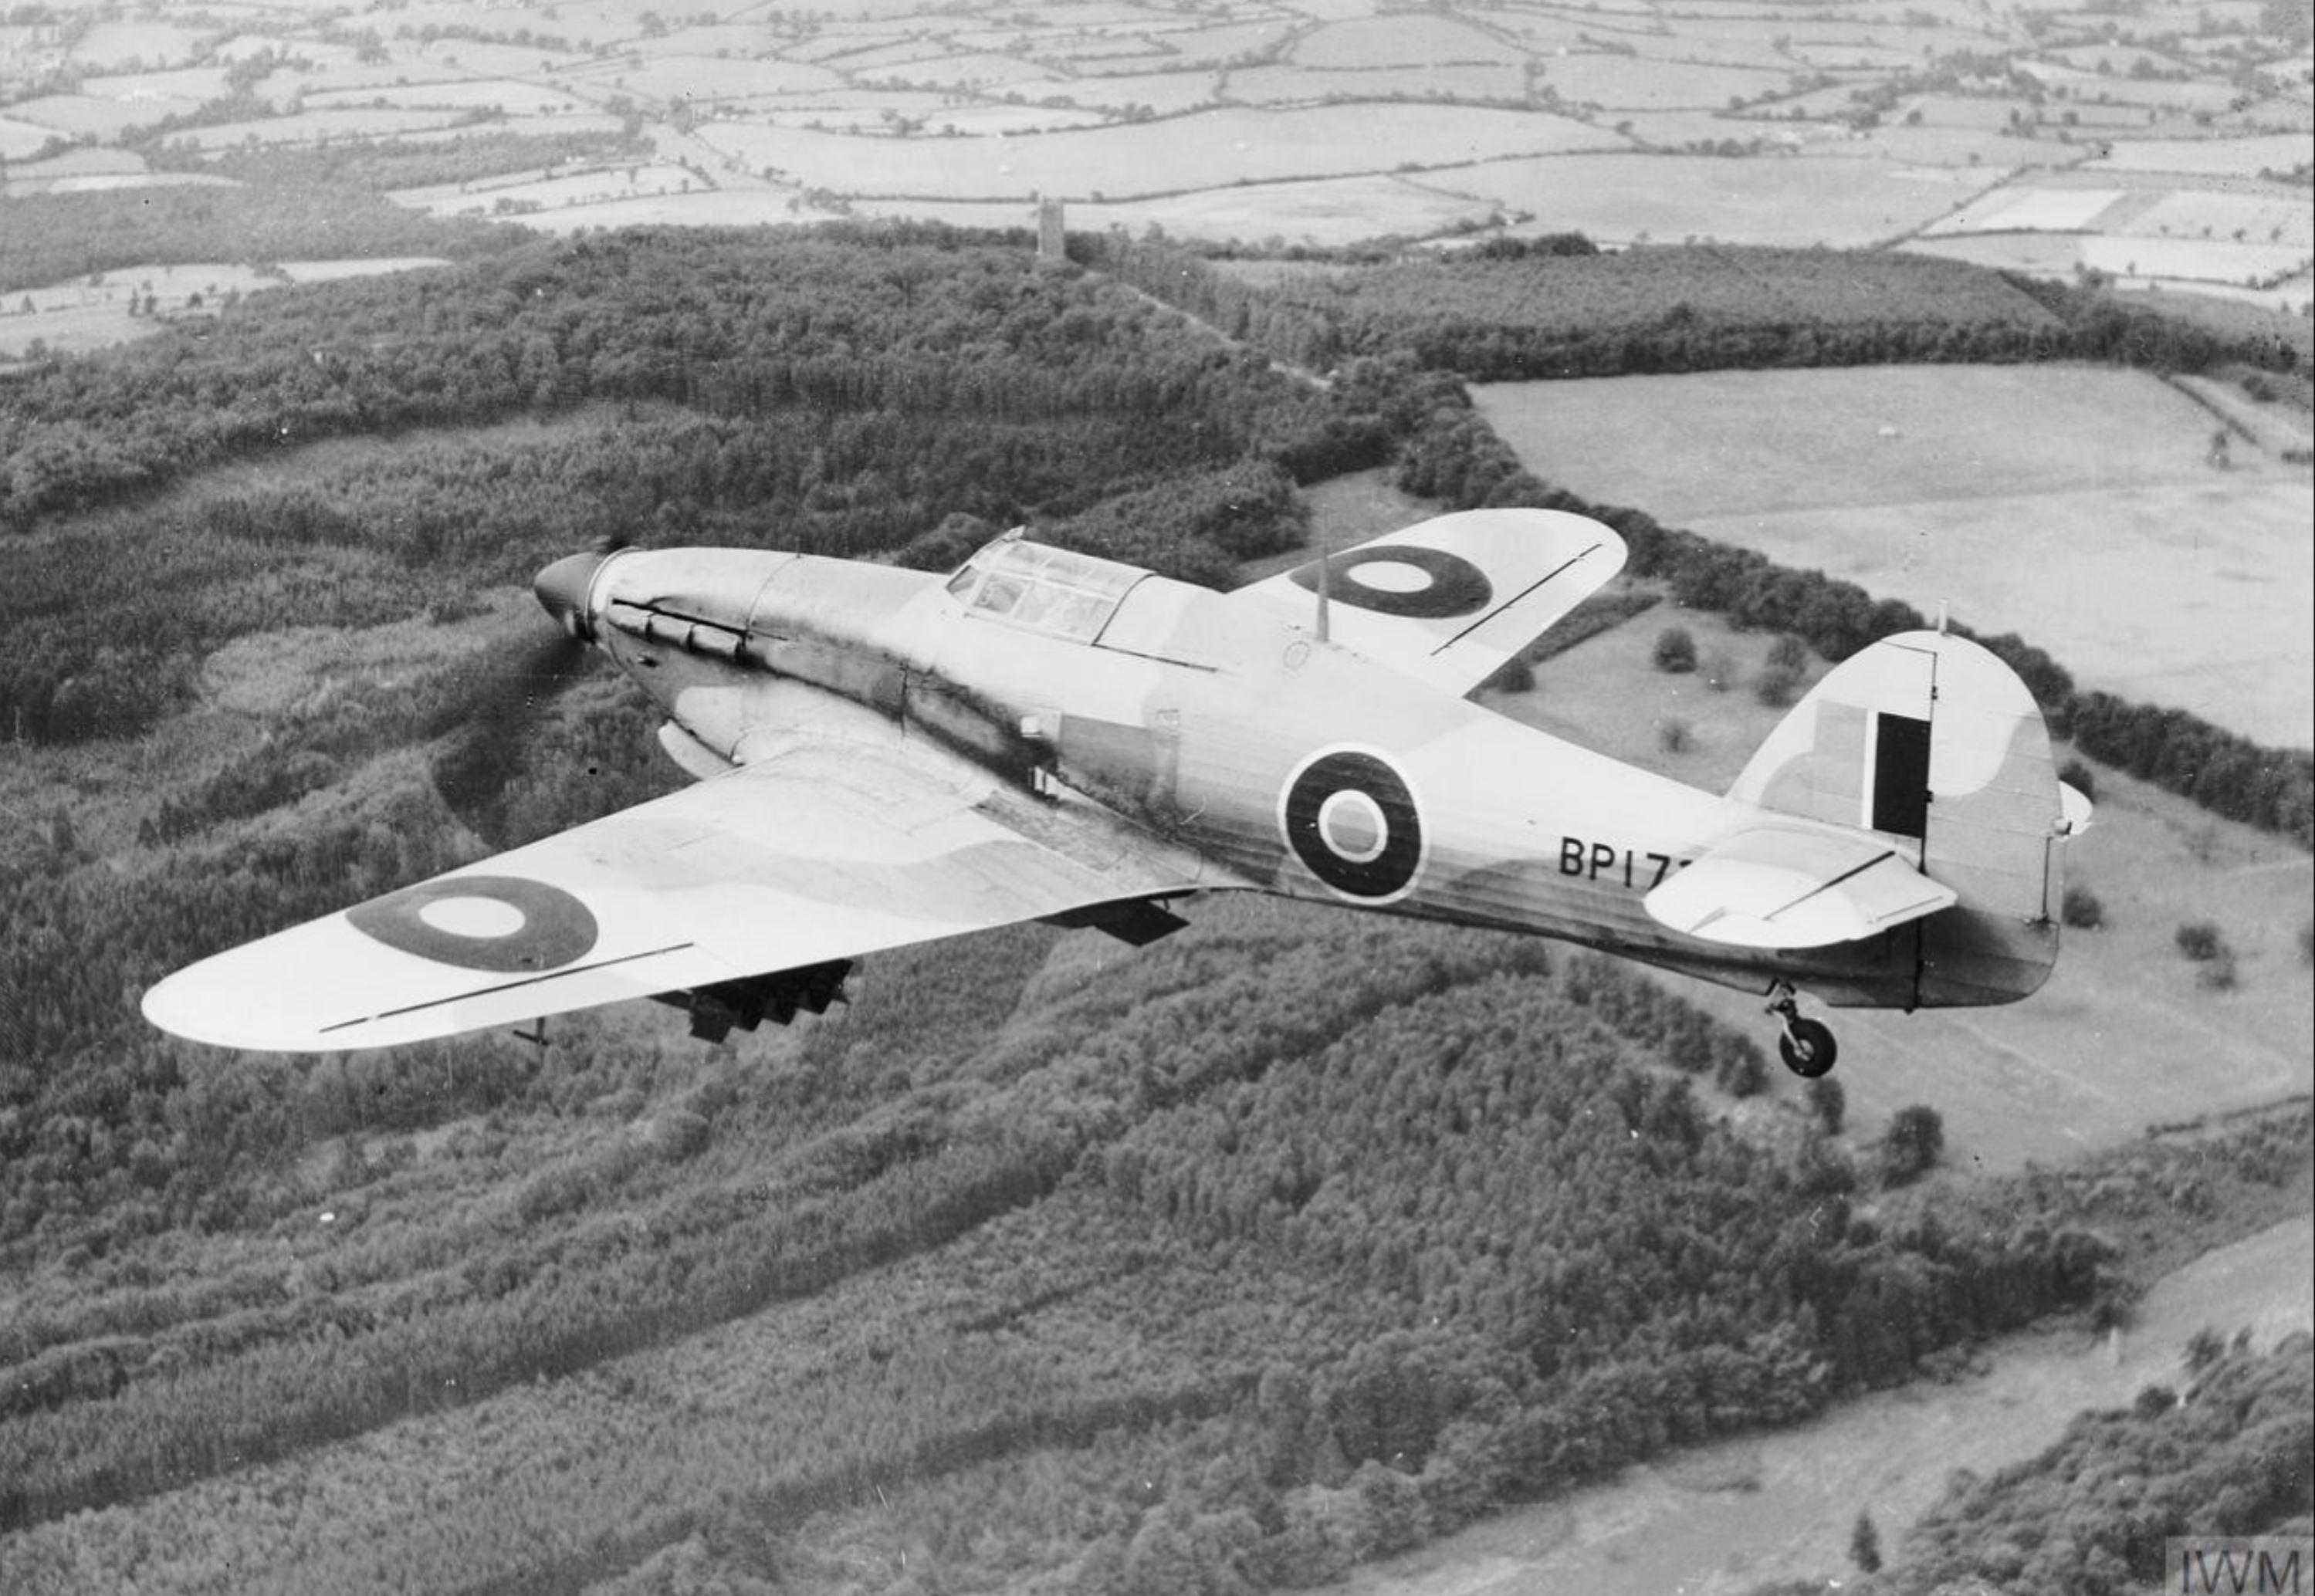 Hawker Hurricane IV RAF BP172 April 1943 IWM MH4943